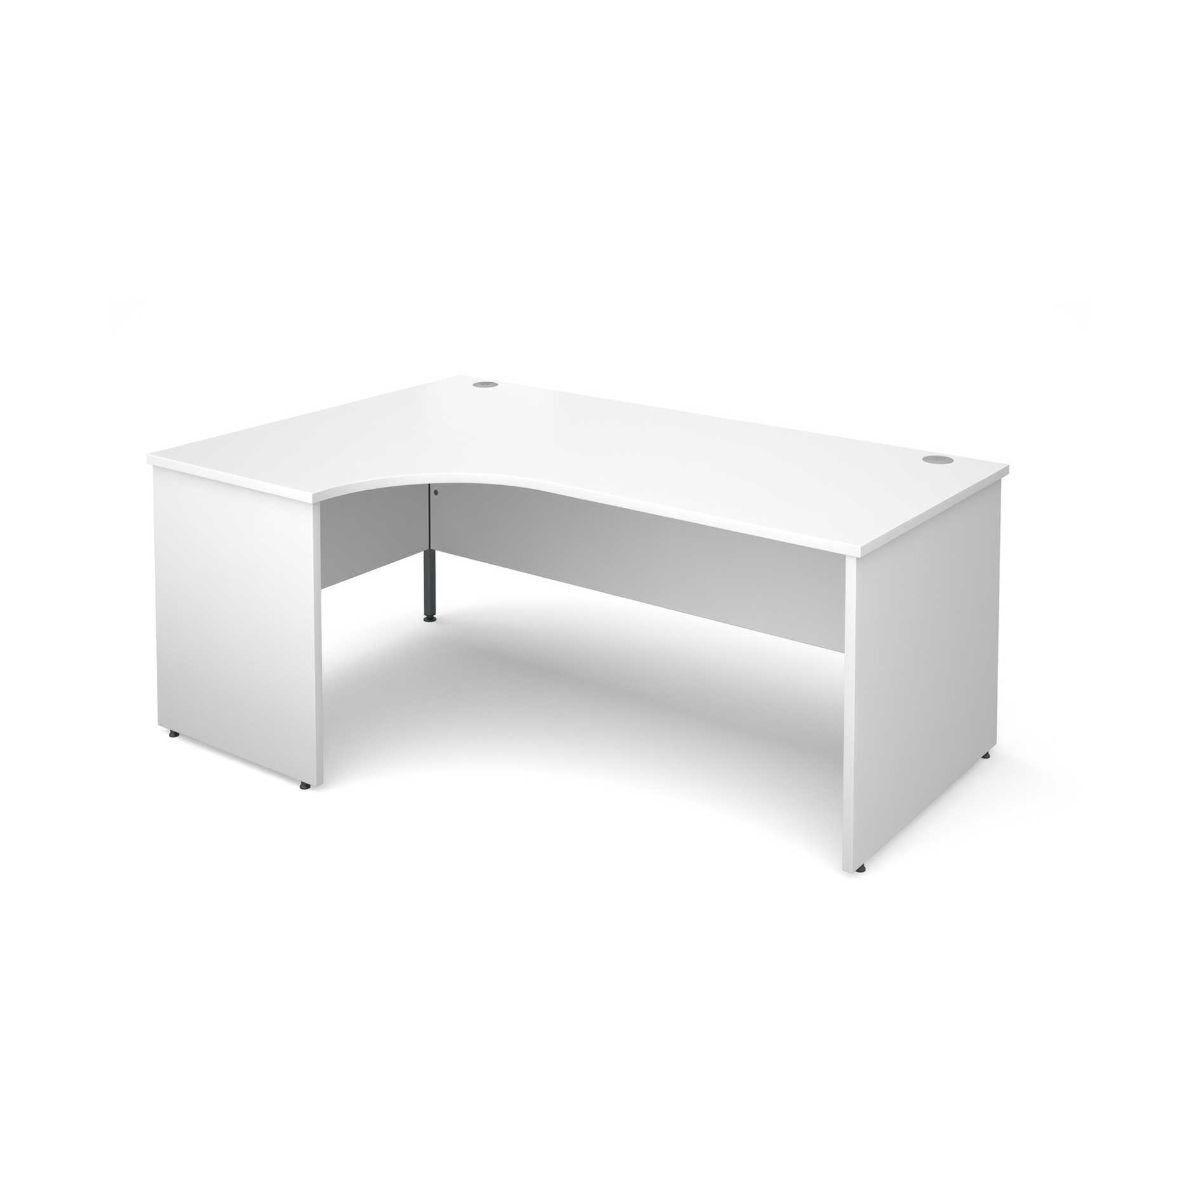 Maestro 25 Left Hand Ergonomic 1800 Desk with End Panel White